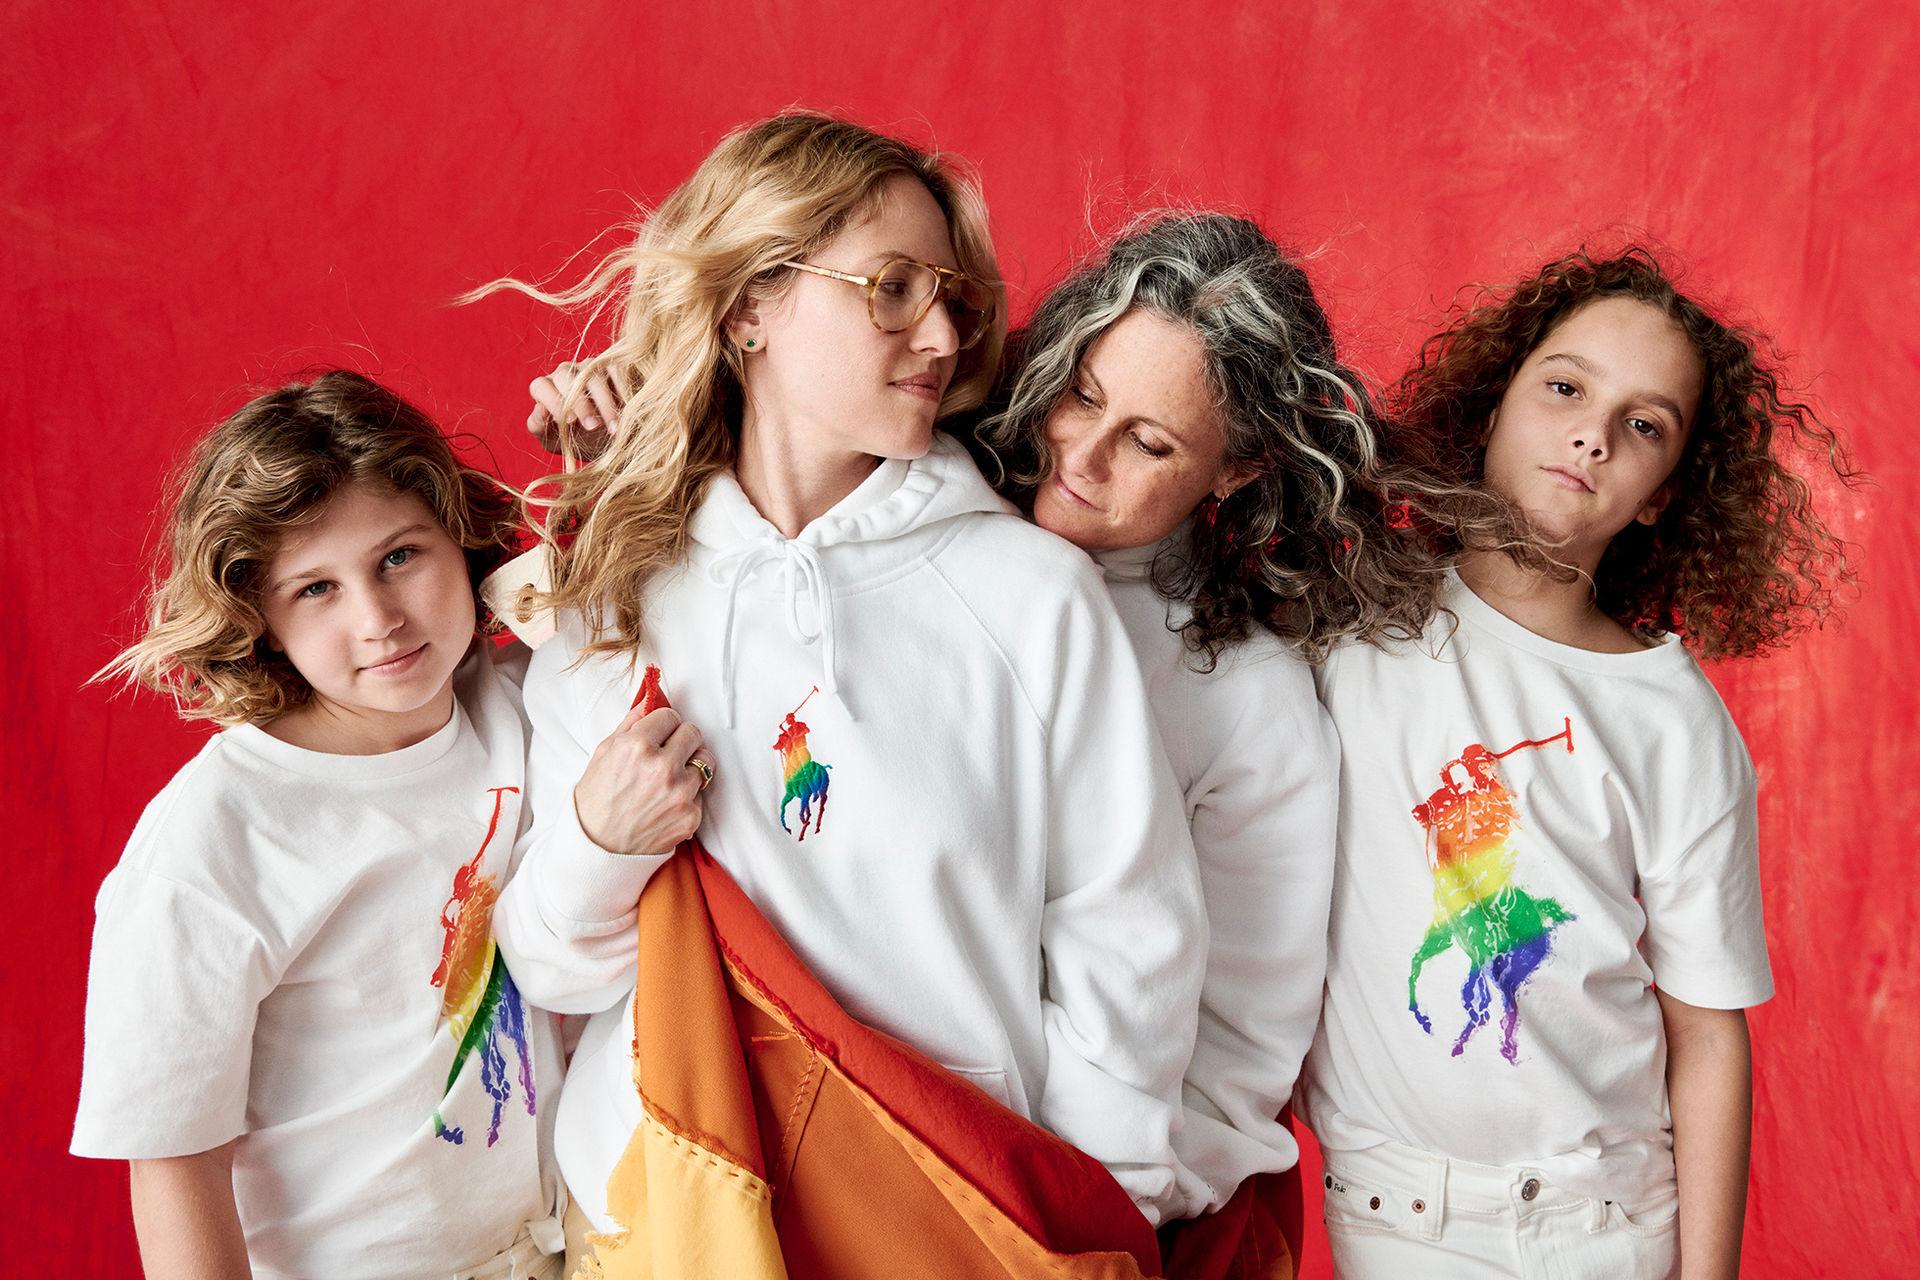 Pride-kollektion från Polo Ralph Lauren